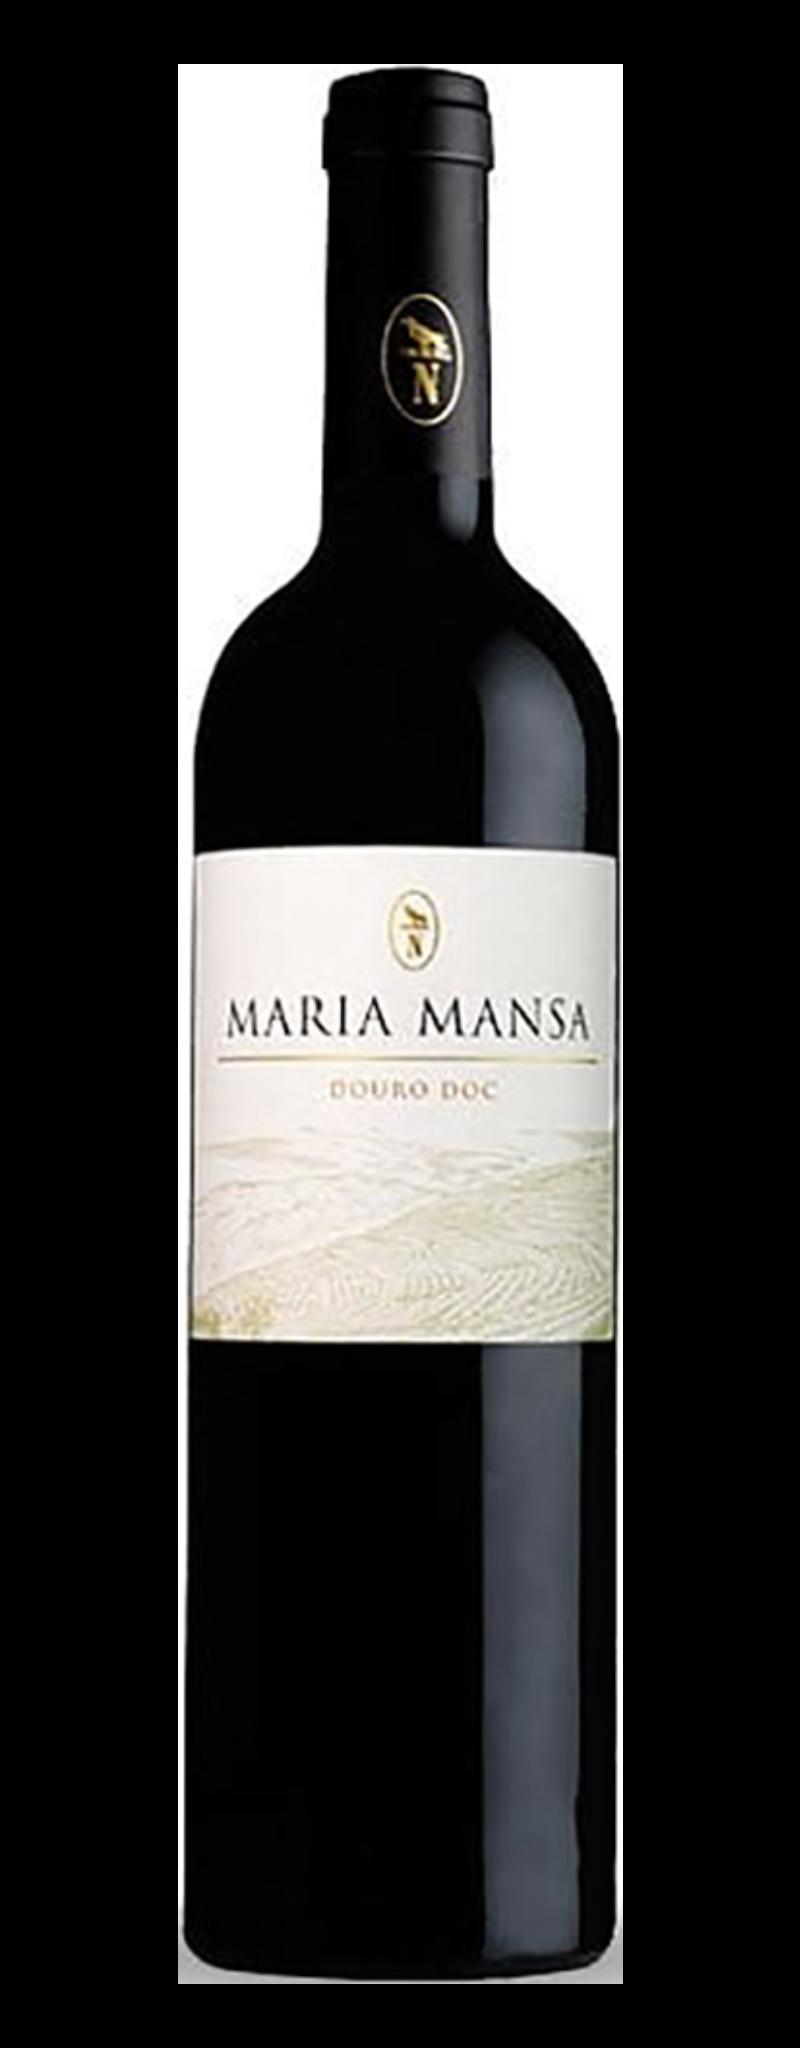 Quinta Do Noval, Dry Wine Masia Mansa, Douro DC  - 750ml